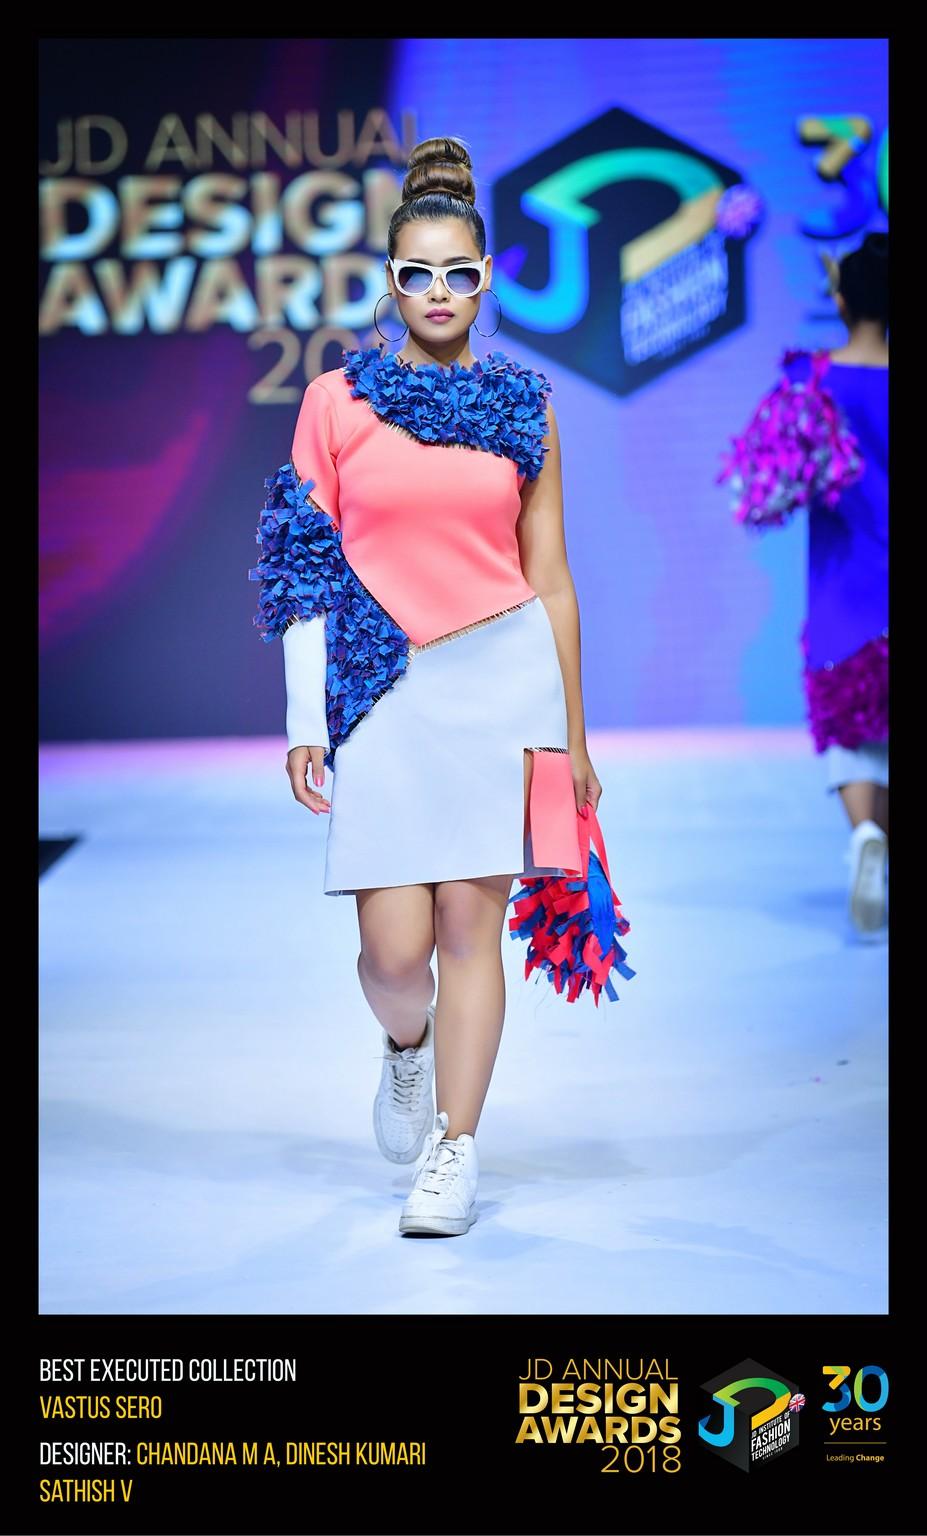 Vastus Sero – Change – JD Annual Design Awards 2018 | Designer: Chandana, Dinesh and Sathish | Photography : Jerin Nath (@jerin_nath) vastus sero – change – jd annual design awards 2018 - VASTUS SERO4 - Vastus Sero – Change – JD Annual Design Awards 2018